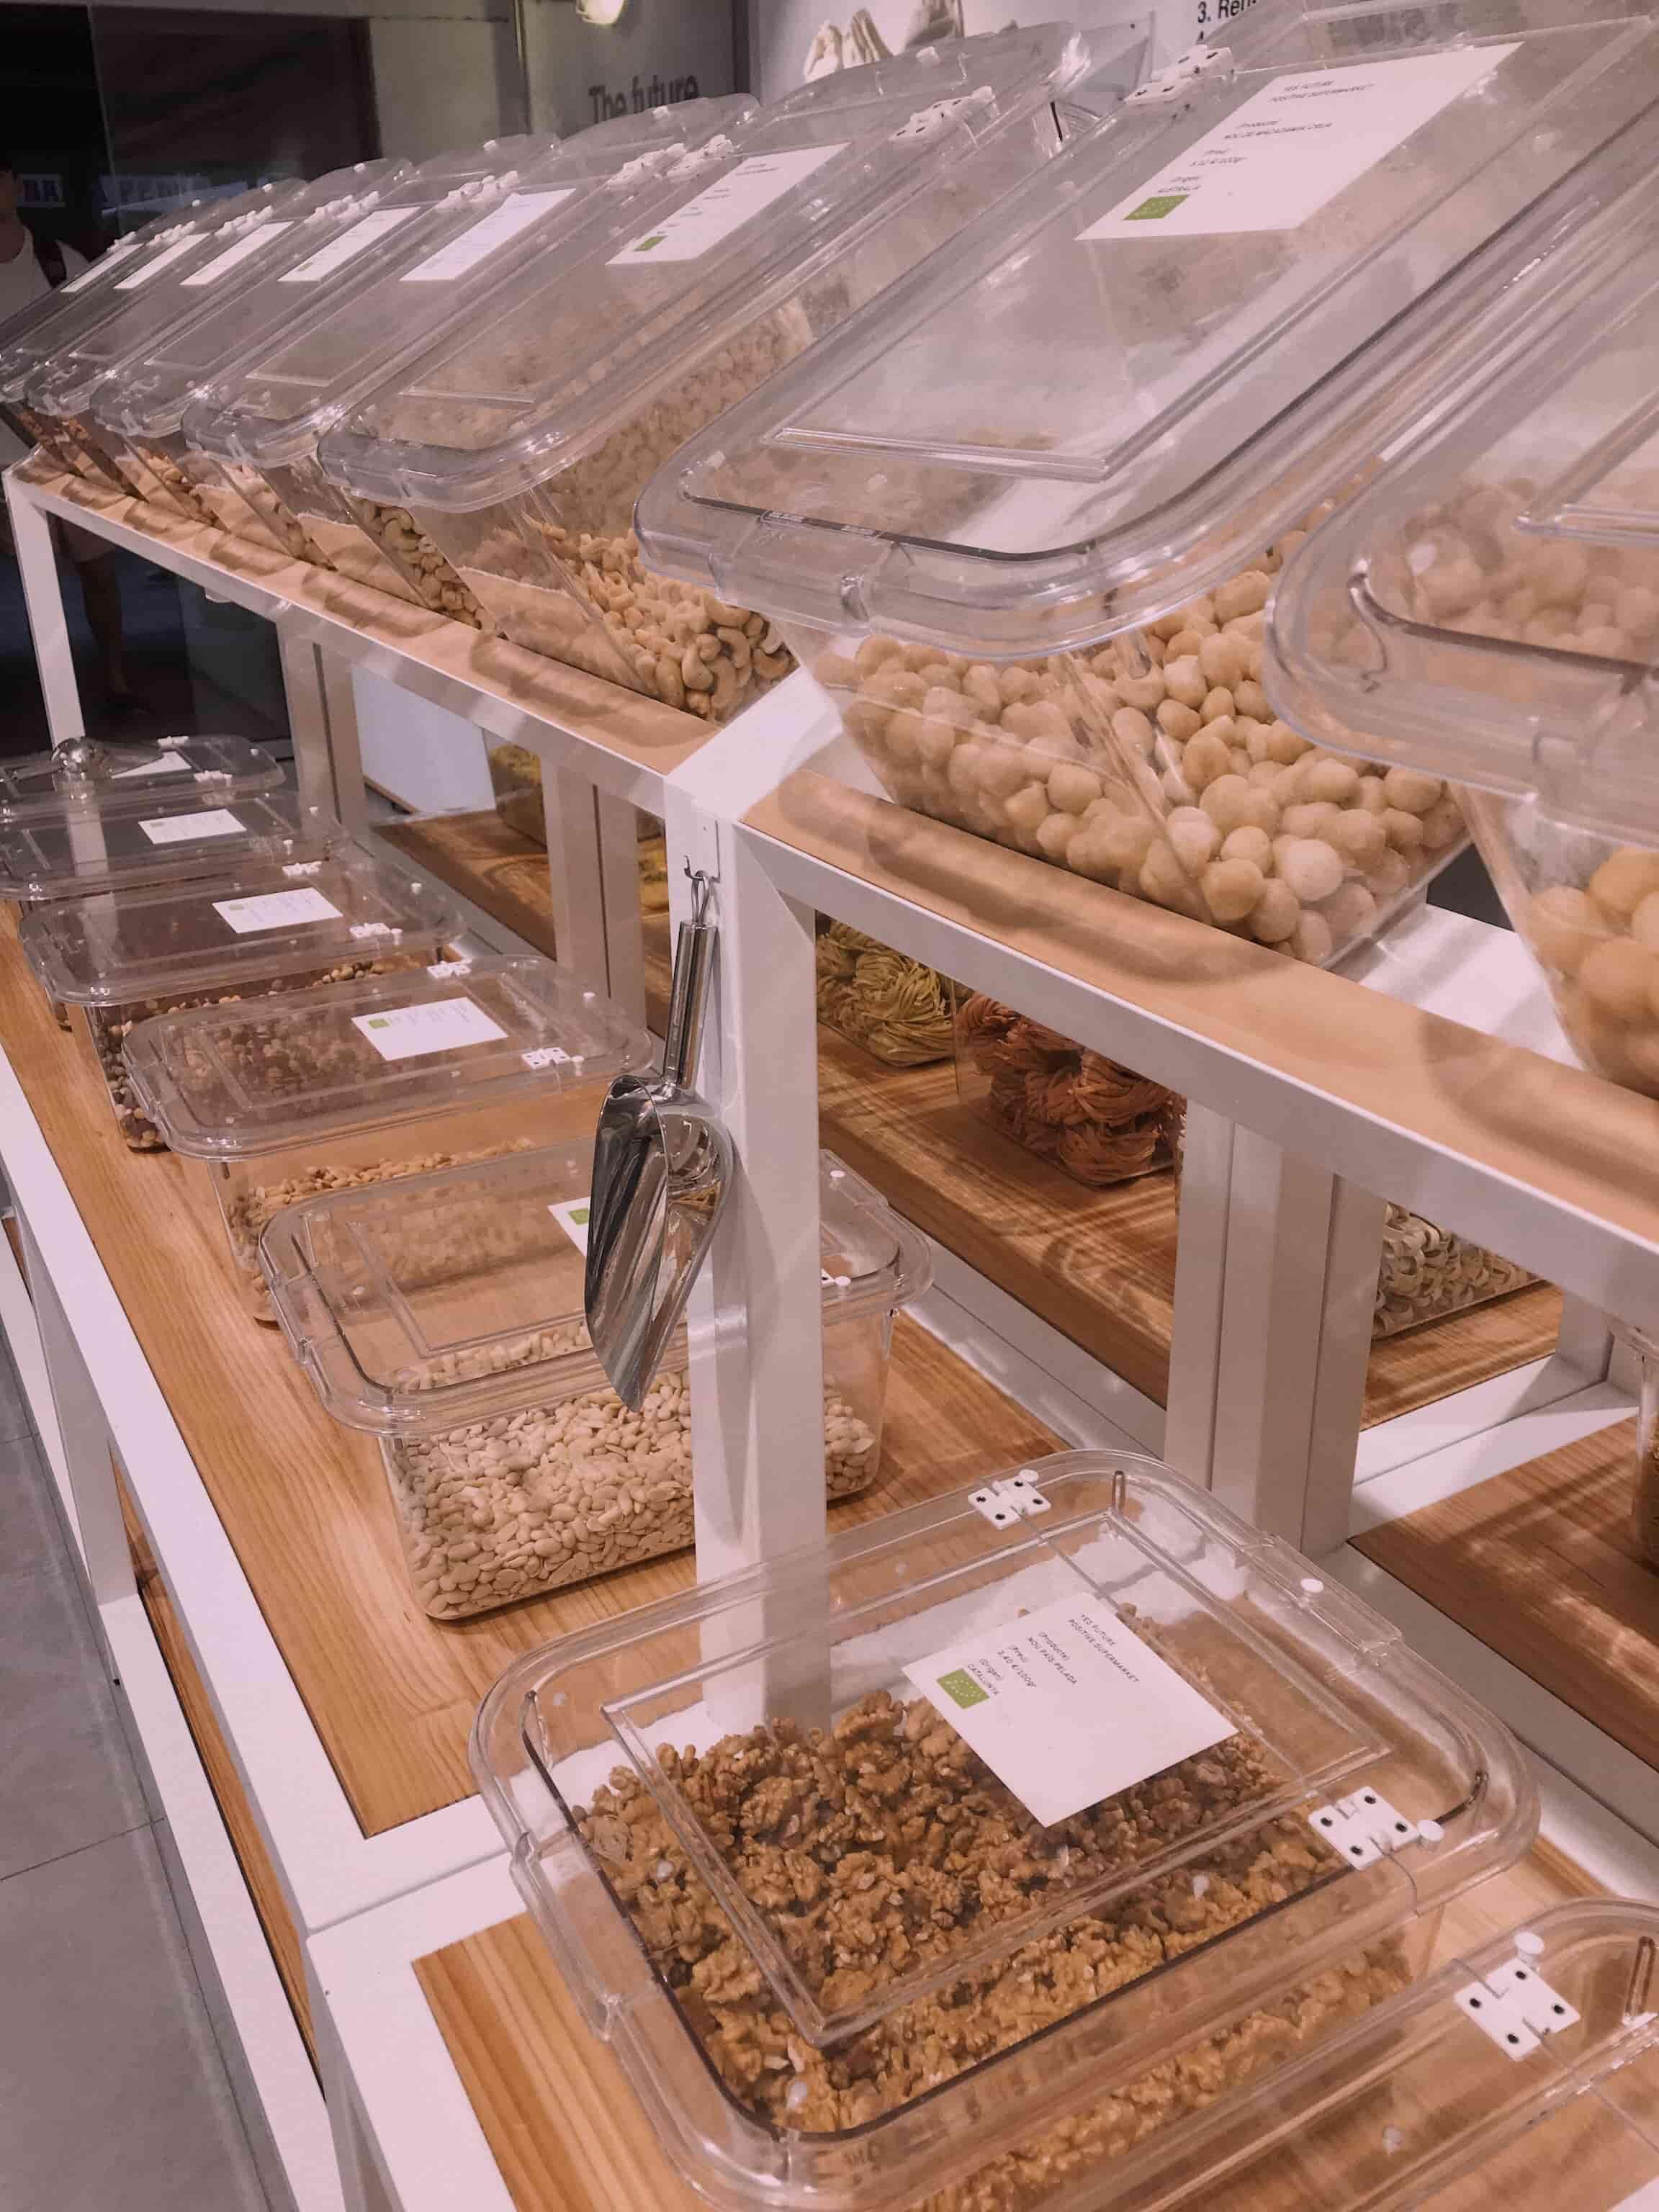 142 Zero Waste Products: Ultimate Beginners List of Zero Waste Swaps - Almost Zero Waste